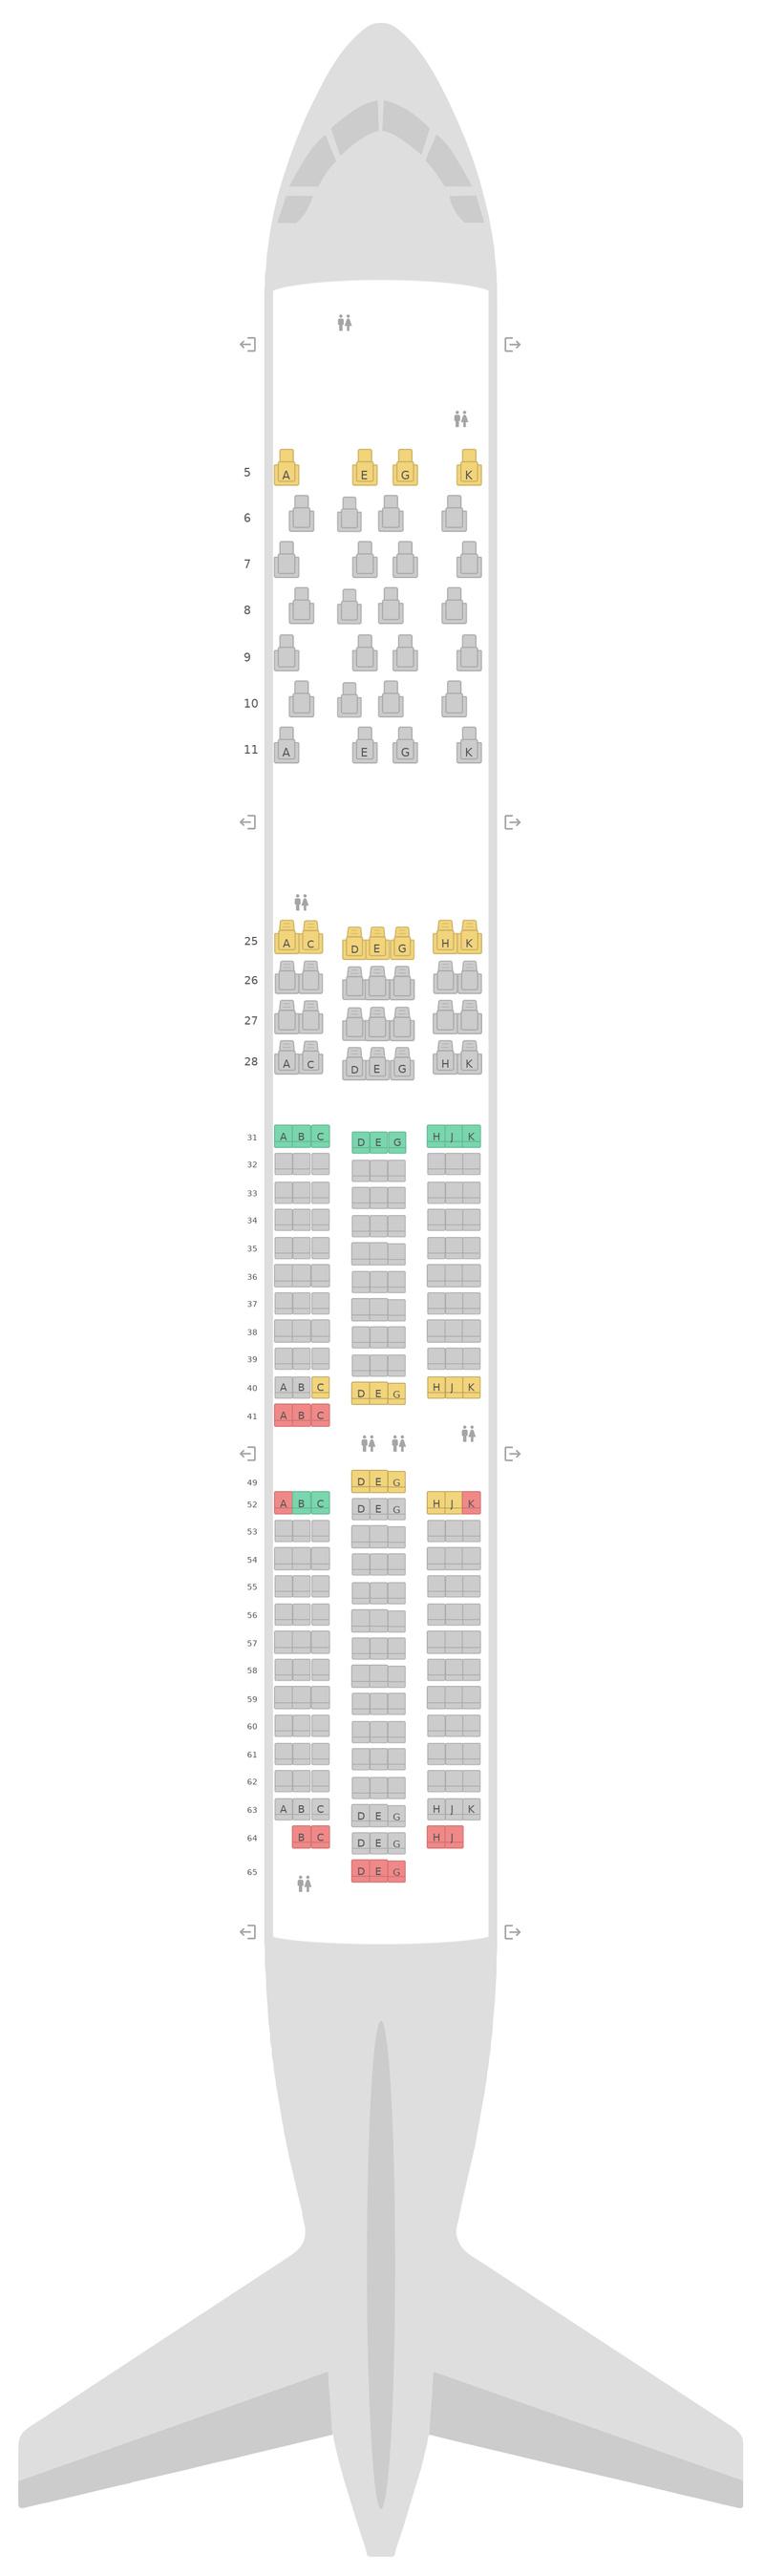 Схема салона Боинг 787-9 (789) v2 China Southern Airlines